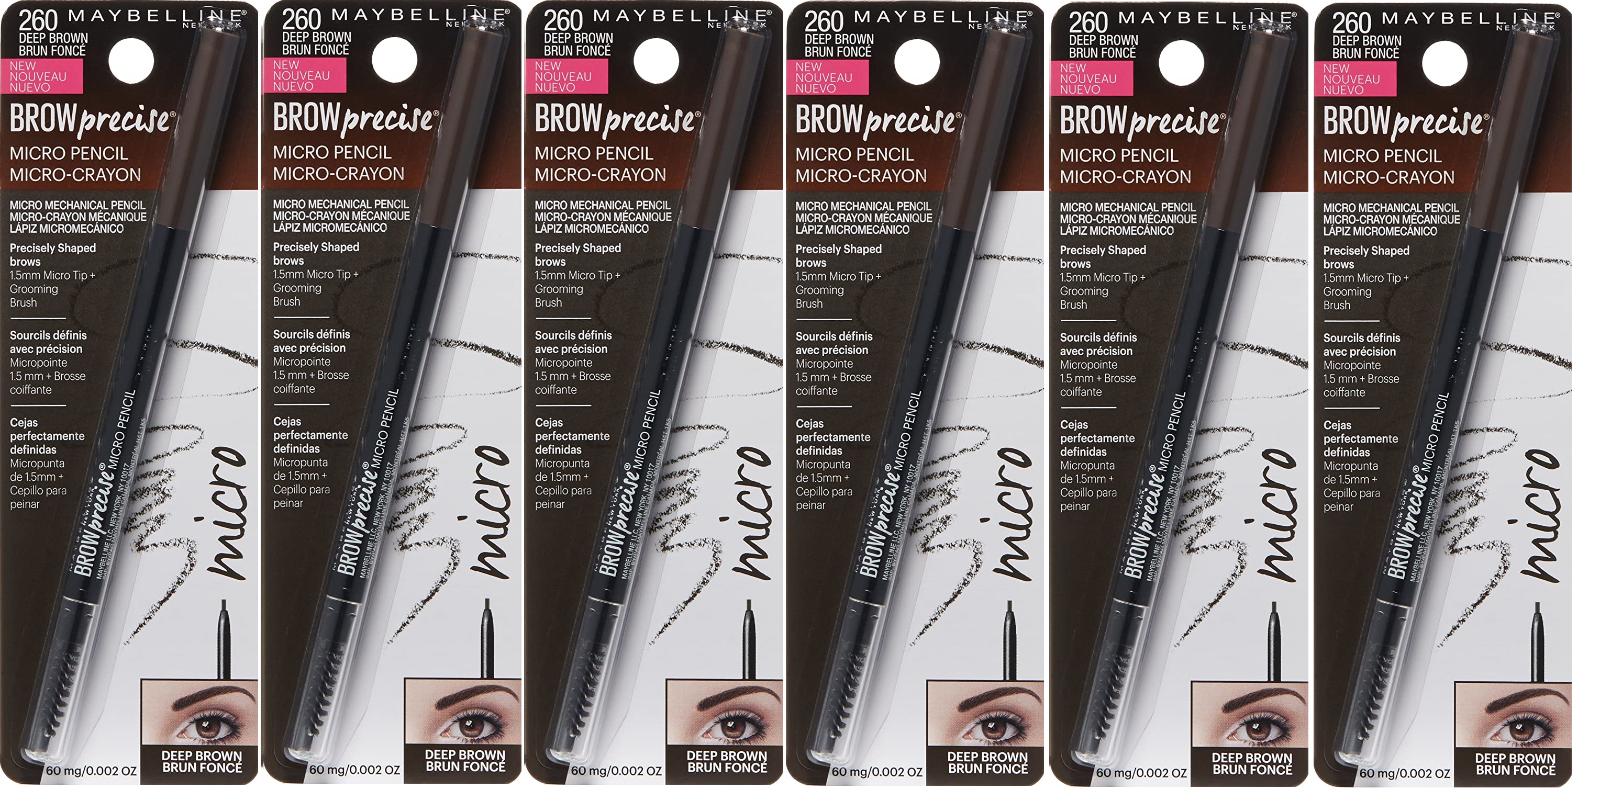 Maybelline New York Brow Precise Micro Pencil, Deep Brown, 0